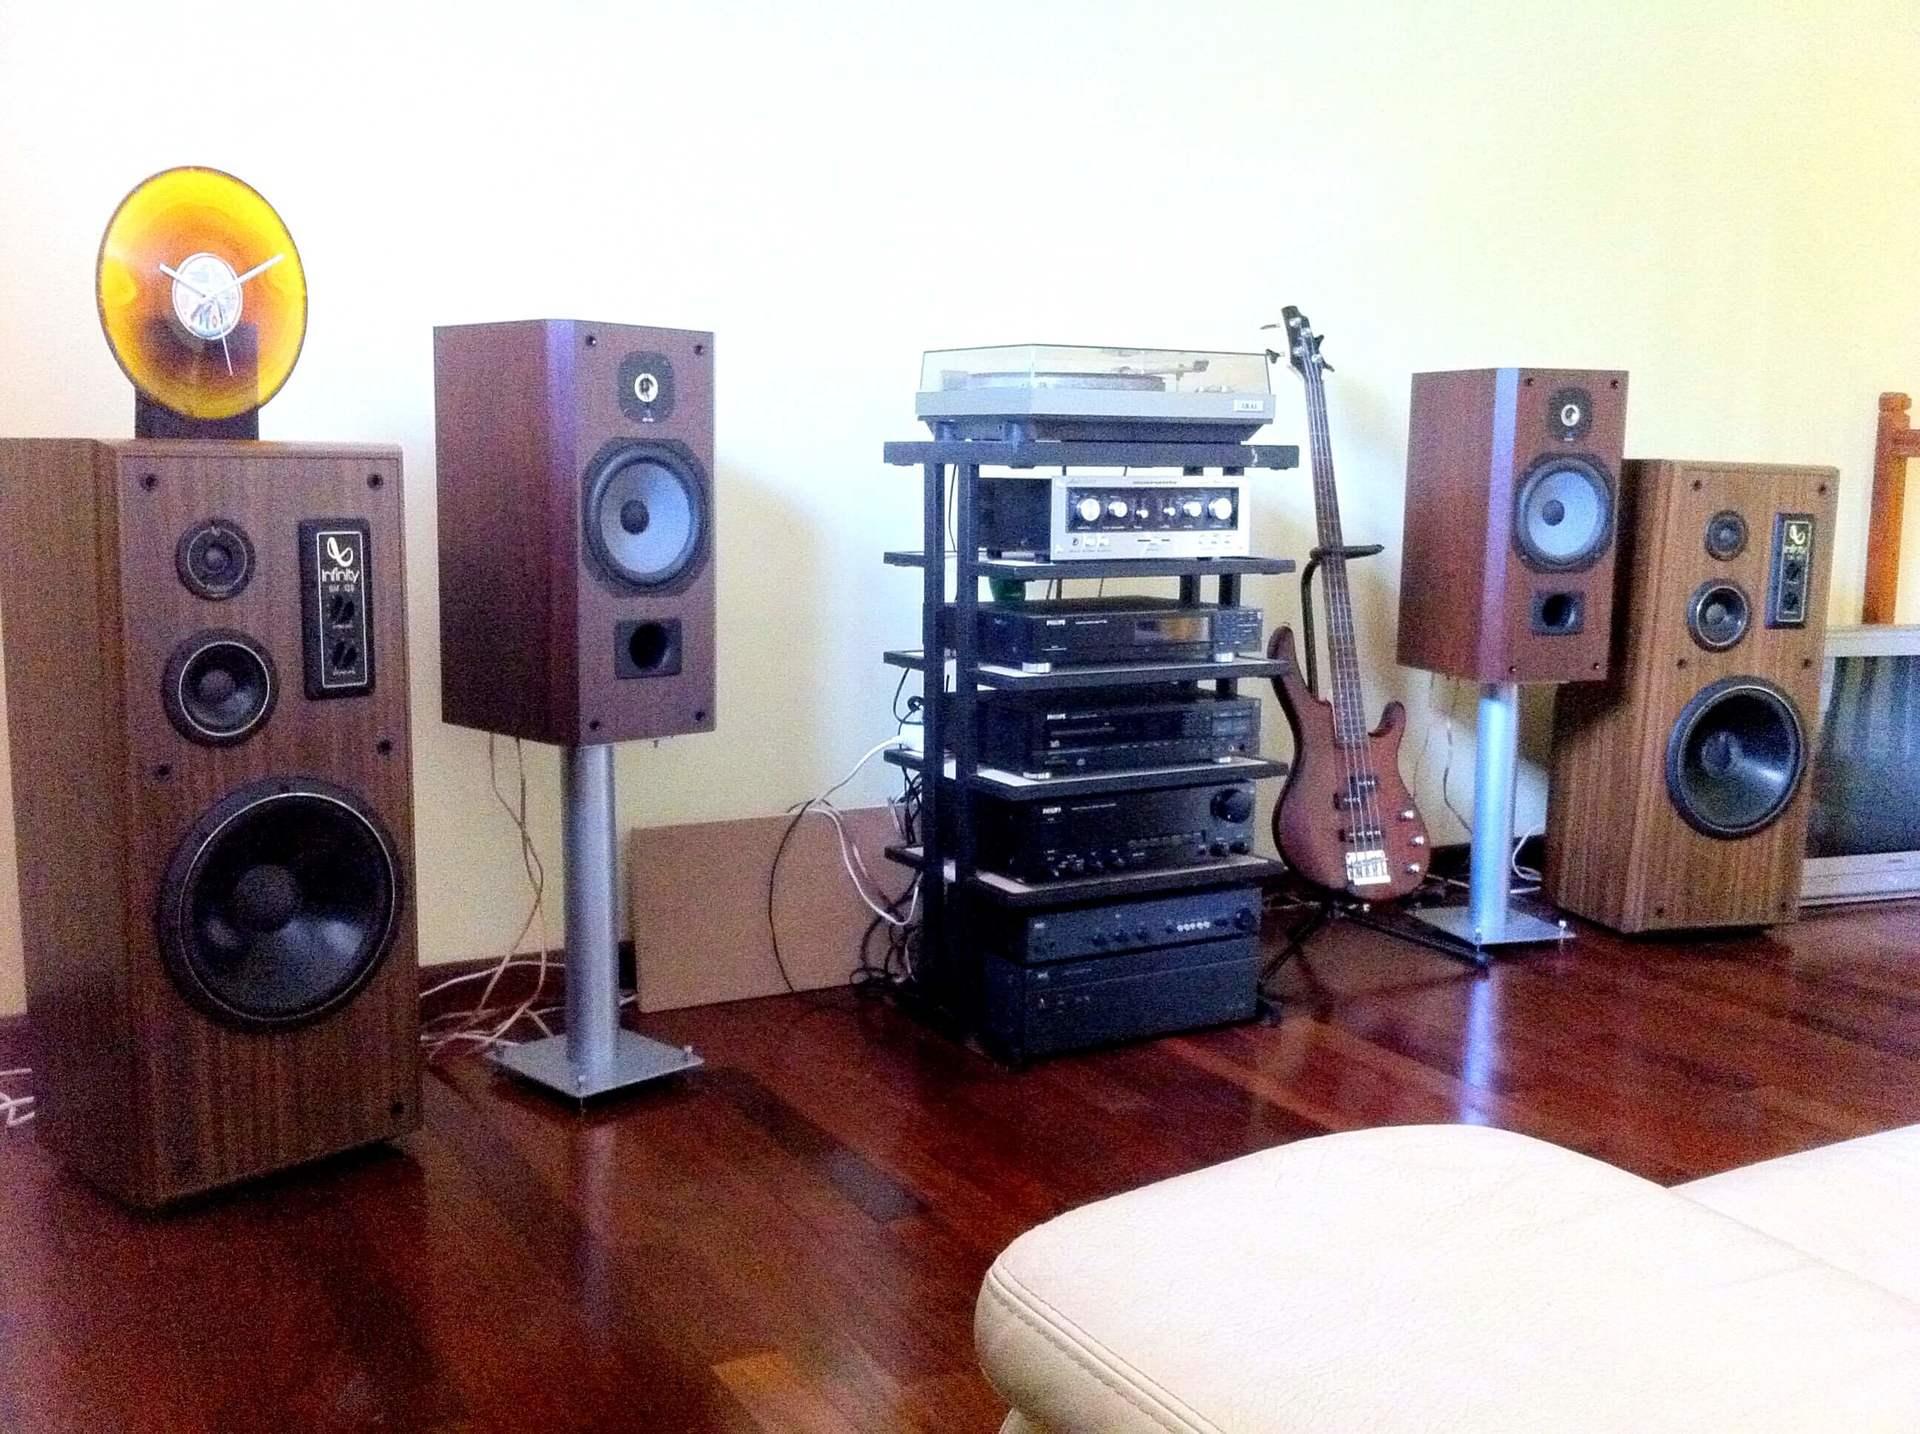 Аудиодайджест #6: «Сделай сам», интересное о звуке и аудиотехнологиях - 23